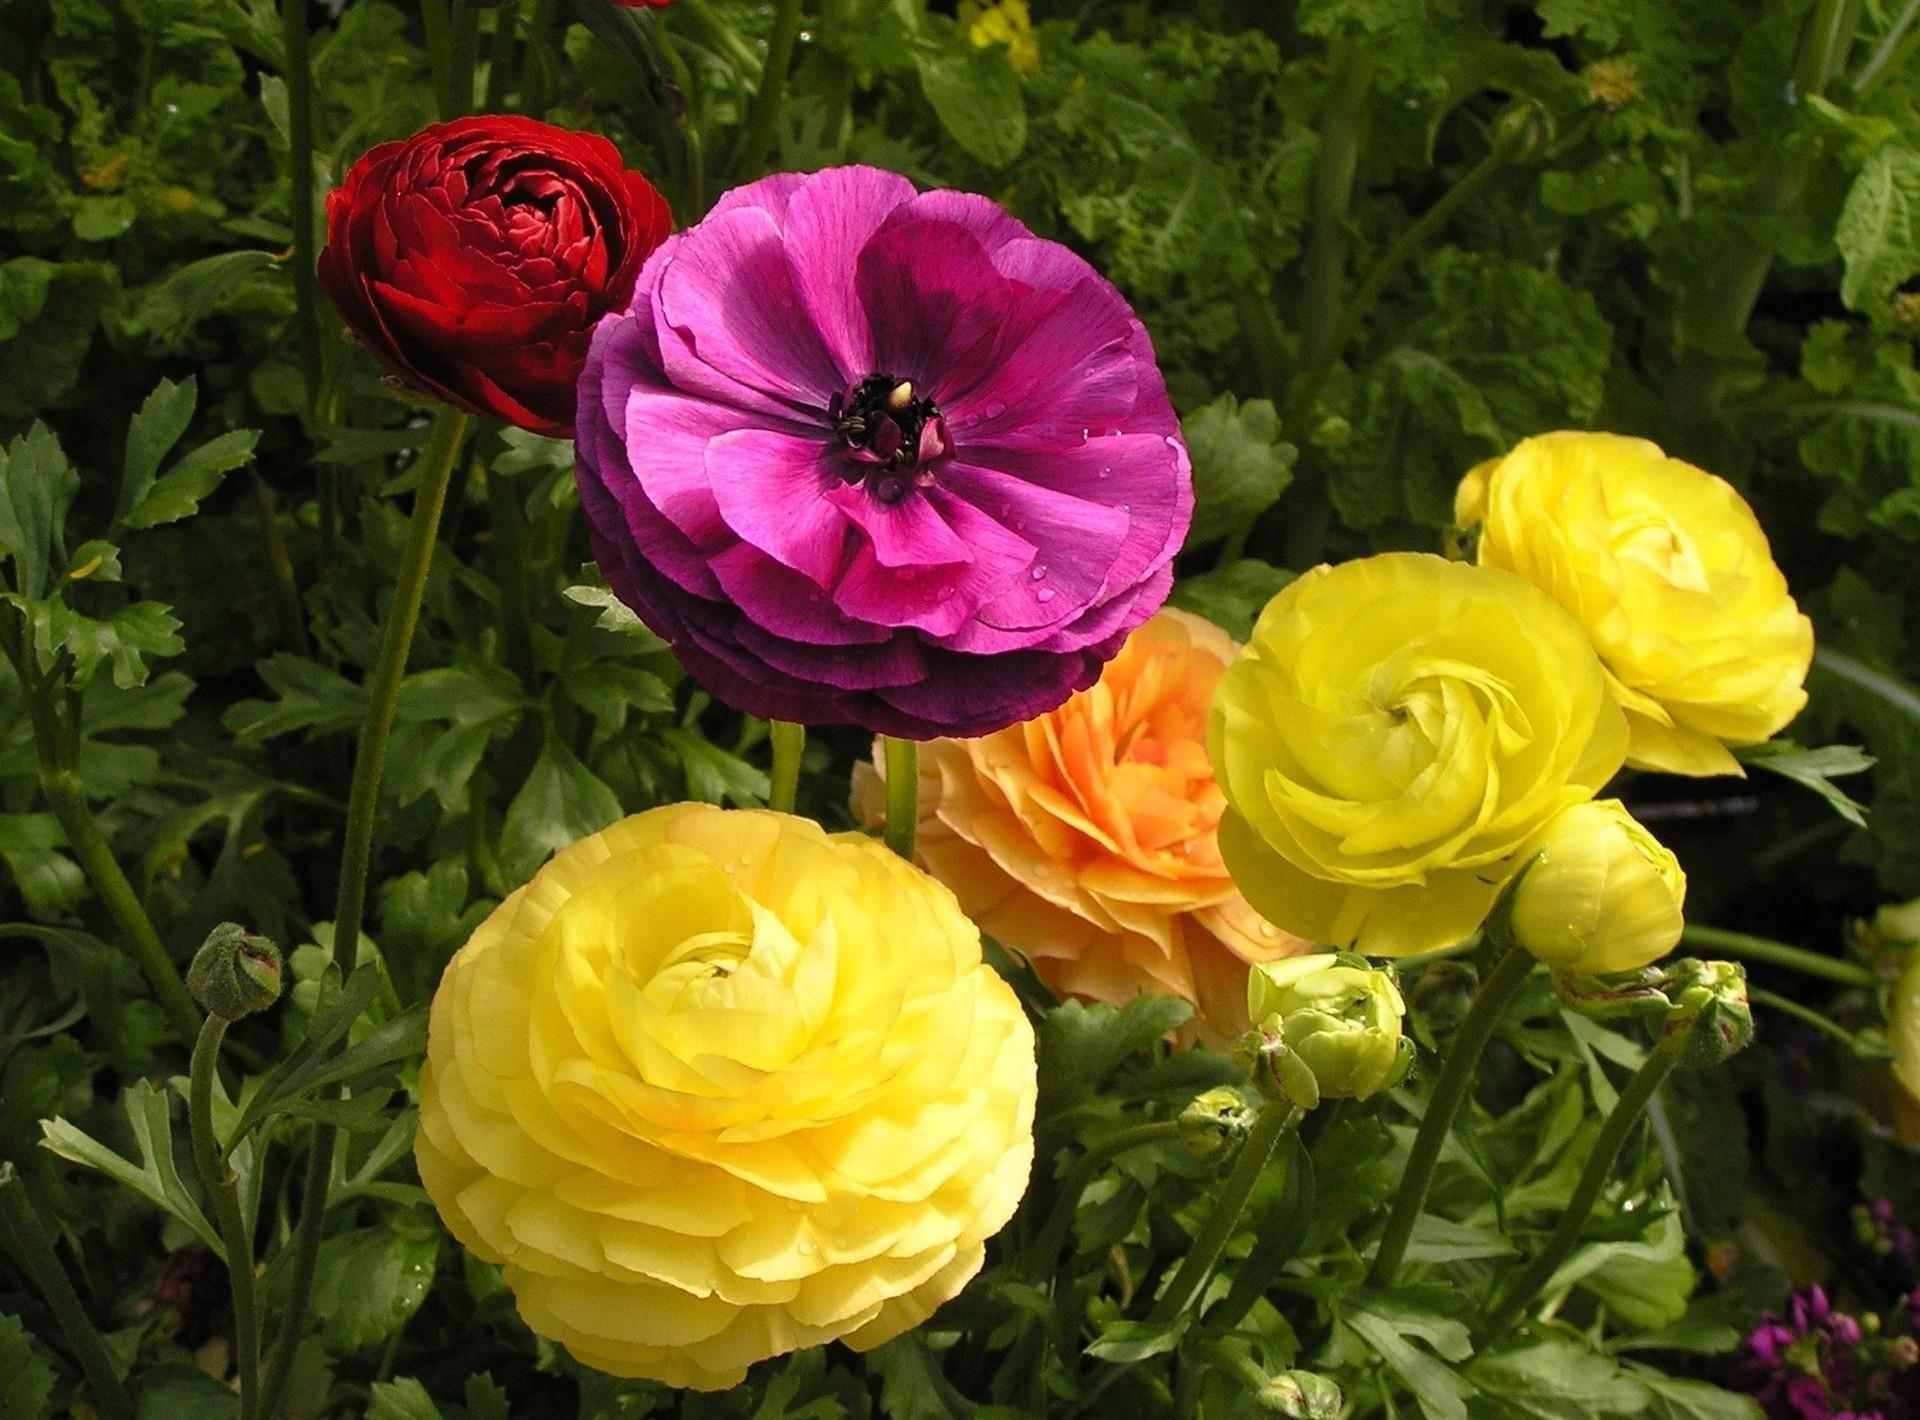 50759 descargar fondo de pantalla Flores, Verduras, Drops, Cama De Flores, Parterre, Ranúnculo, Ranunkulus: protectores de pantalla e imágenes gratis